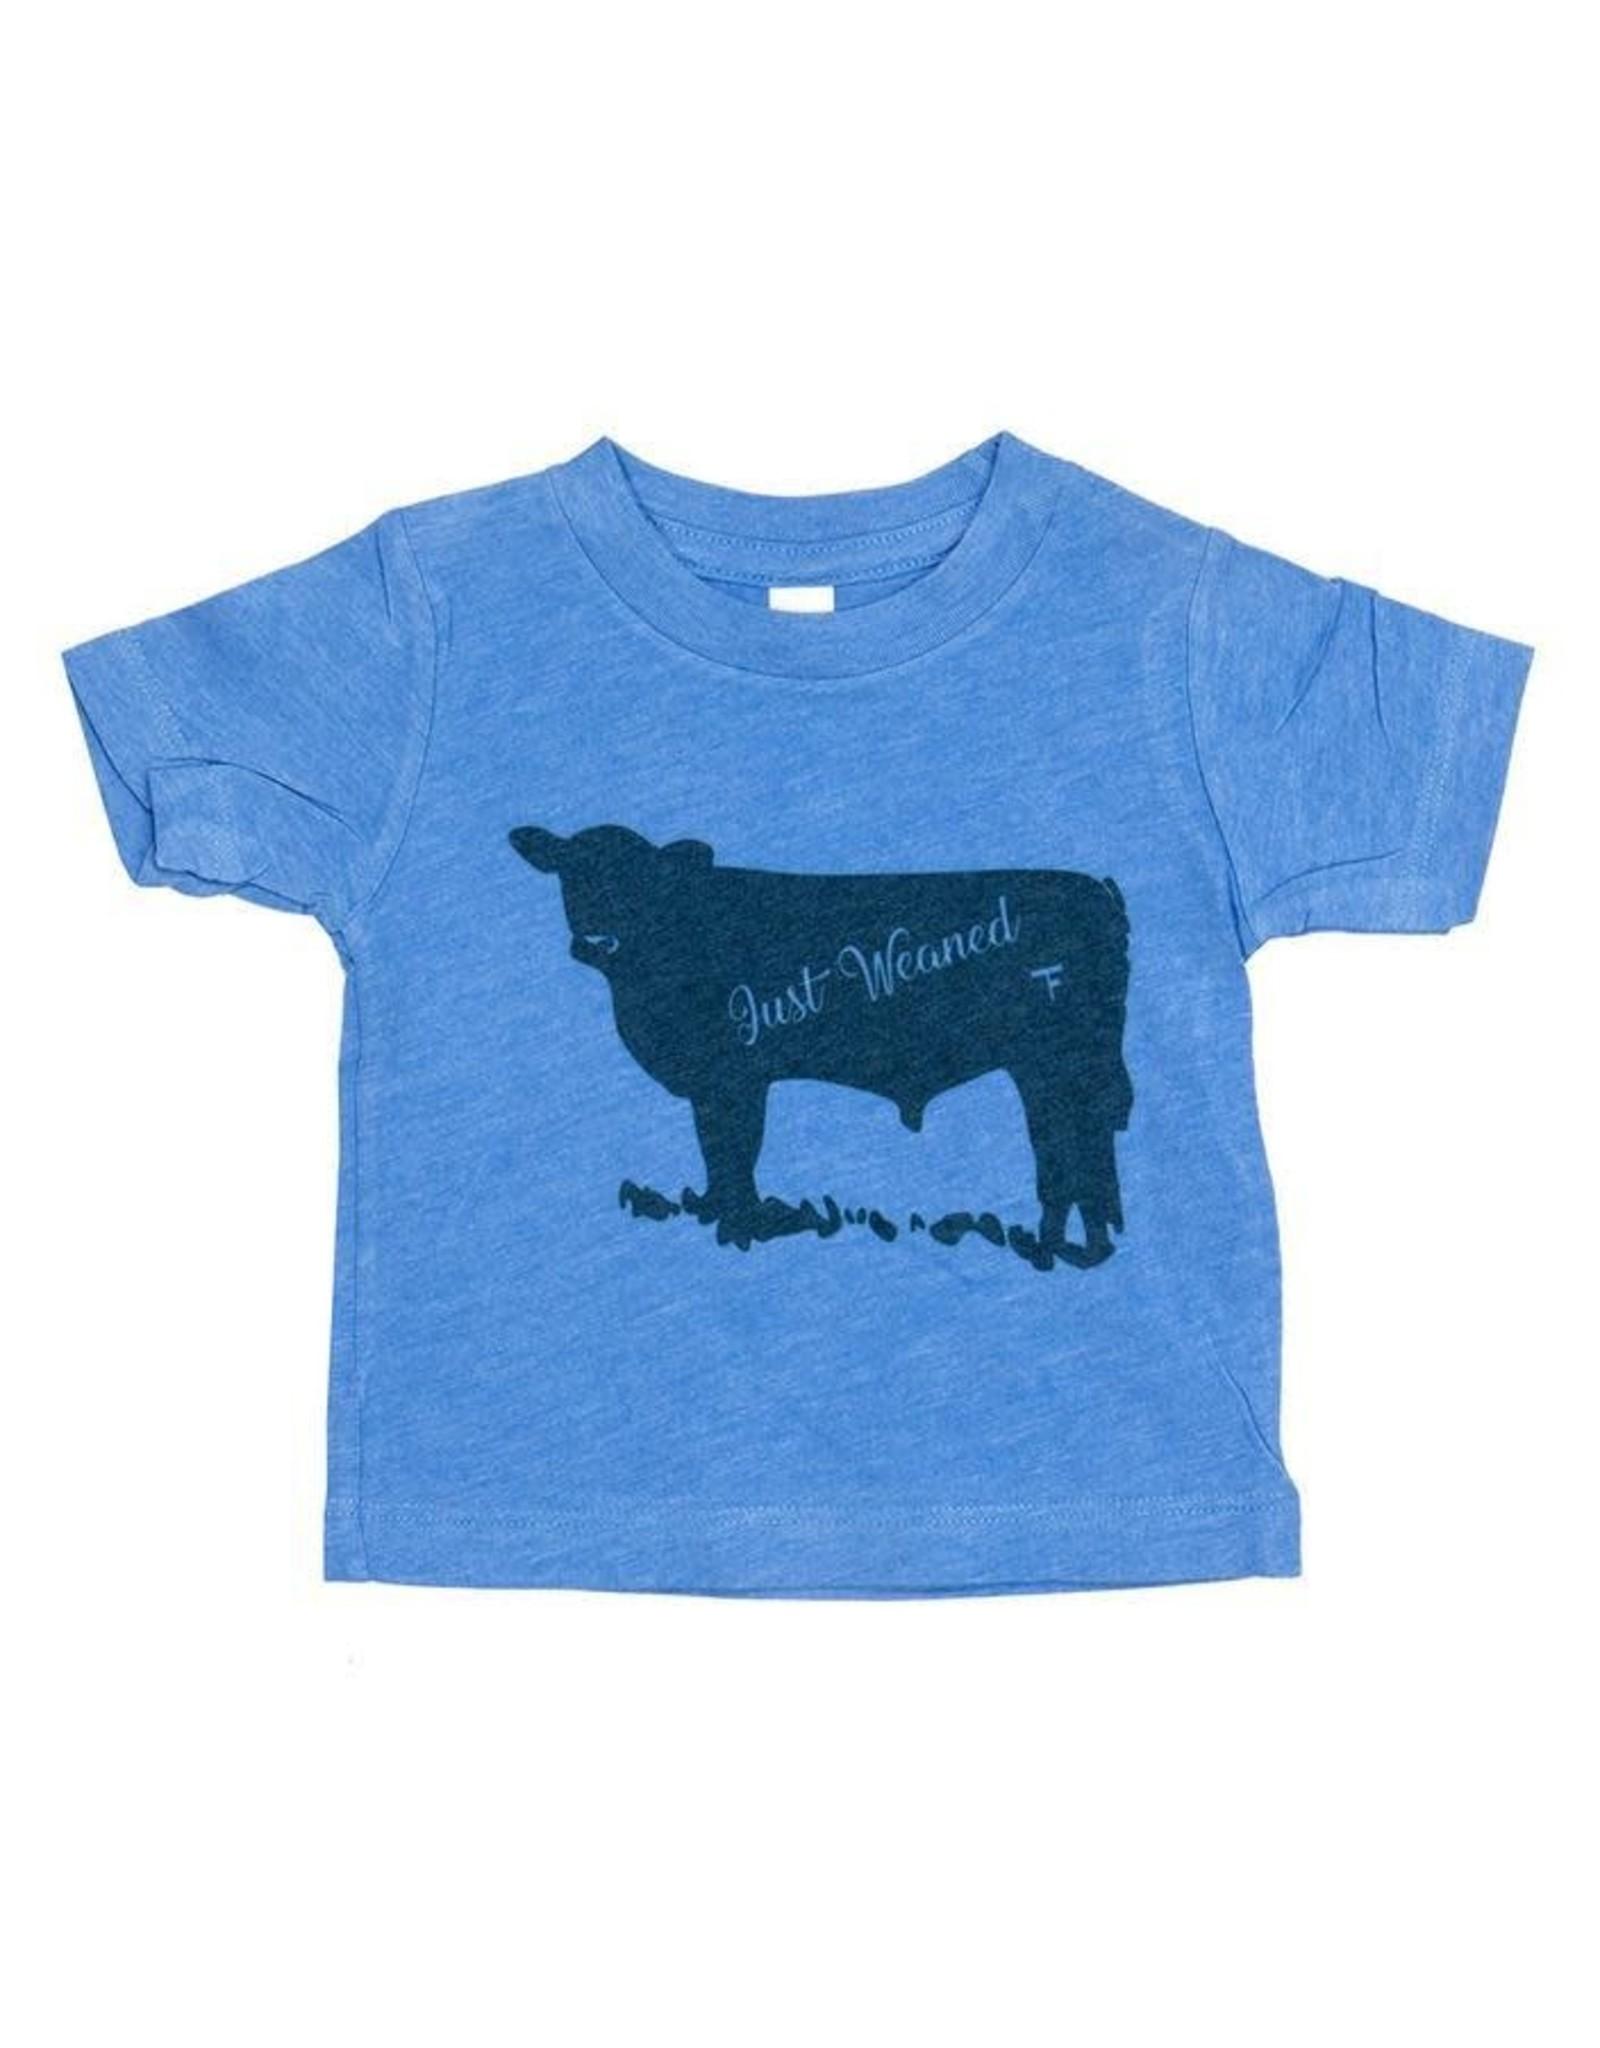 Just Weaned Blue Infant Tee- 6/12 mths TF-JW-TEE